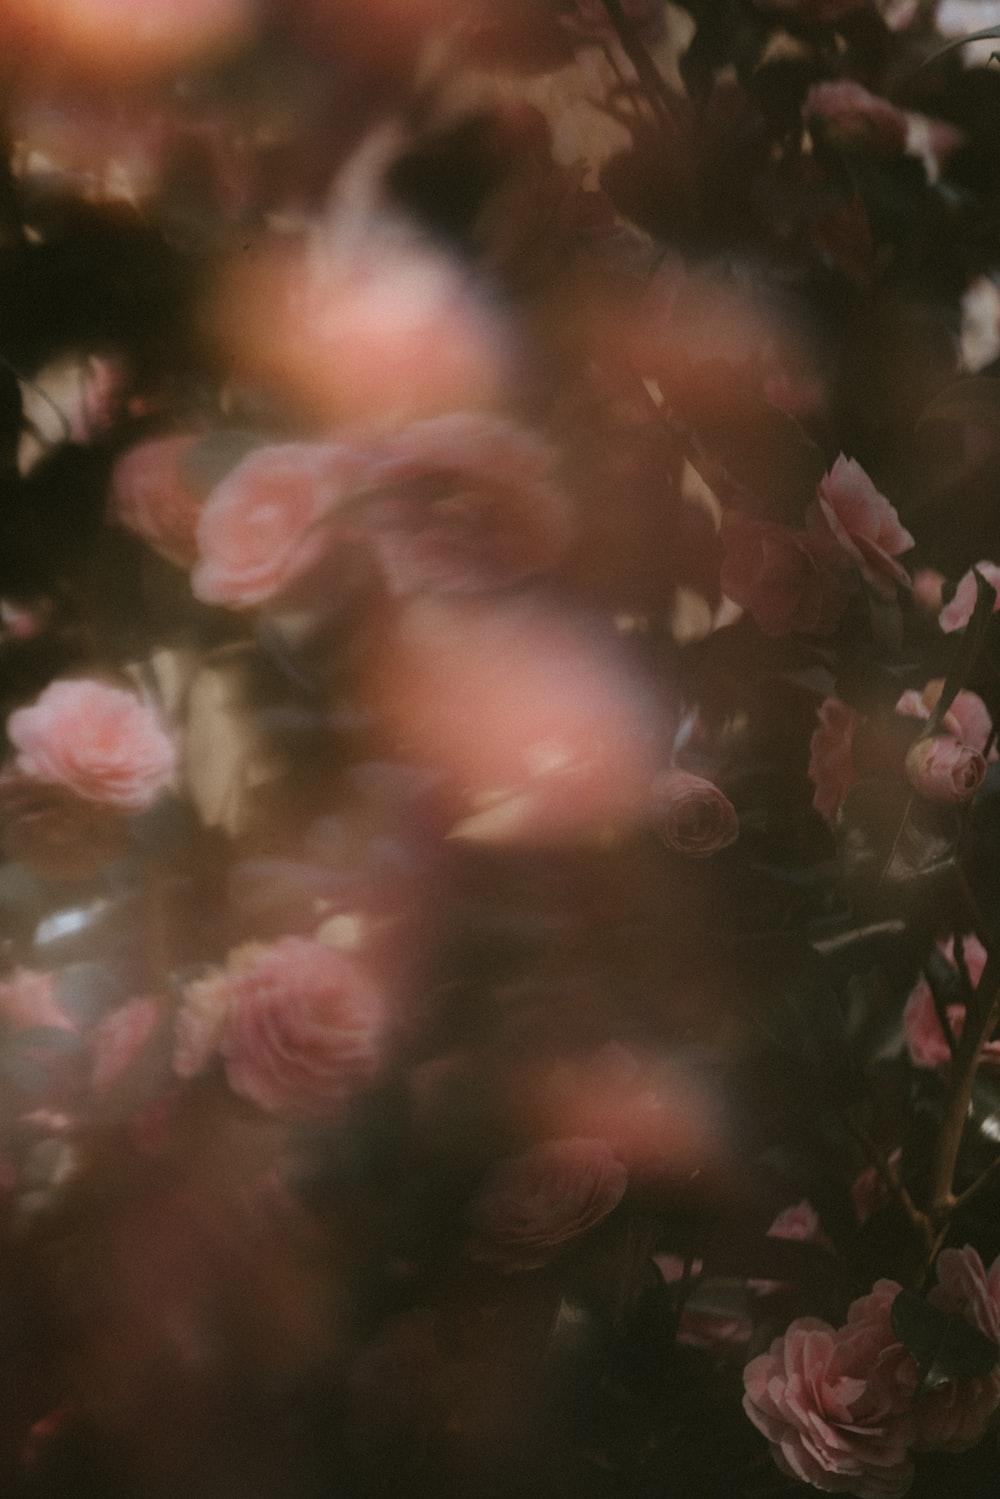 pink roses in closeup photo